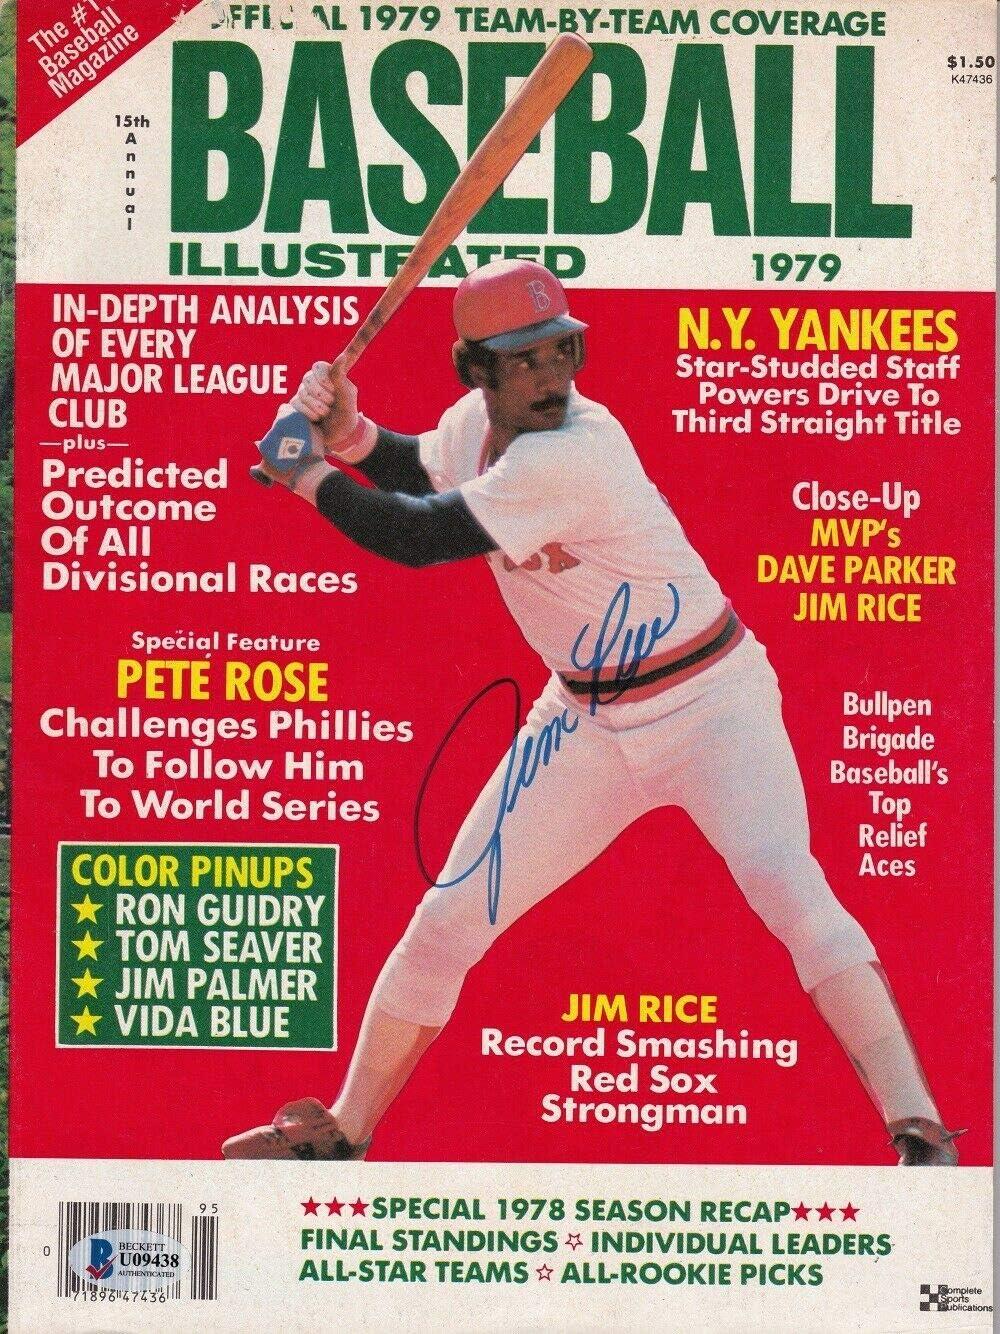 Jim Rice Autographed Signed Boston Illustrated 1979 Latest item shop Mag Baseball